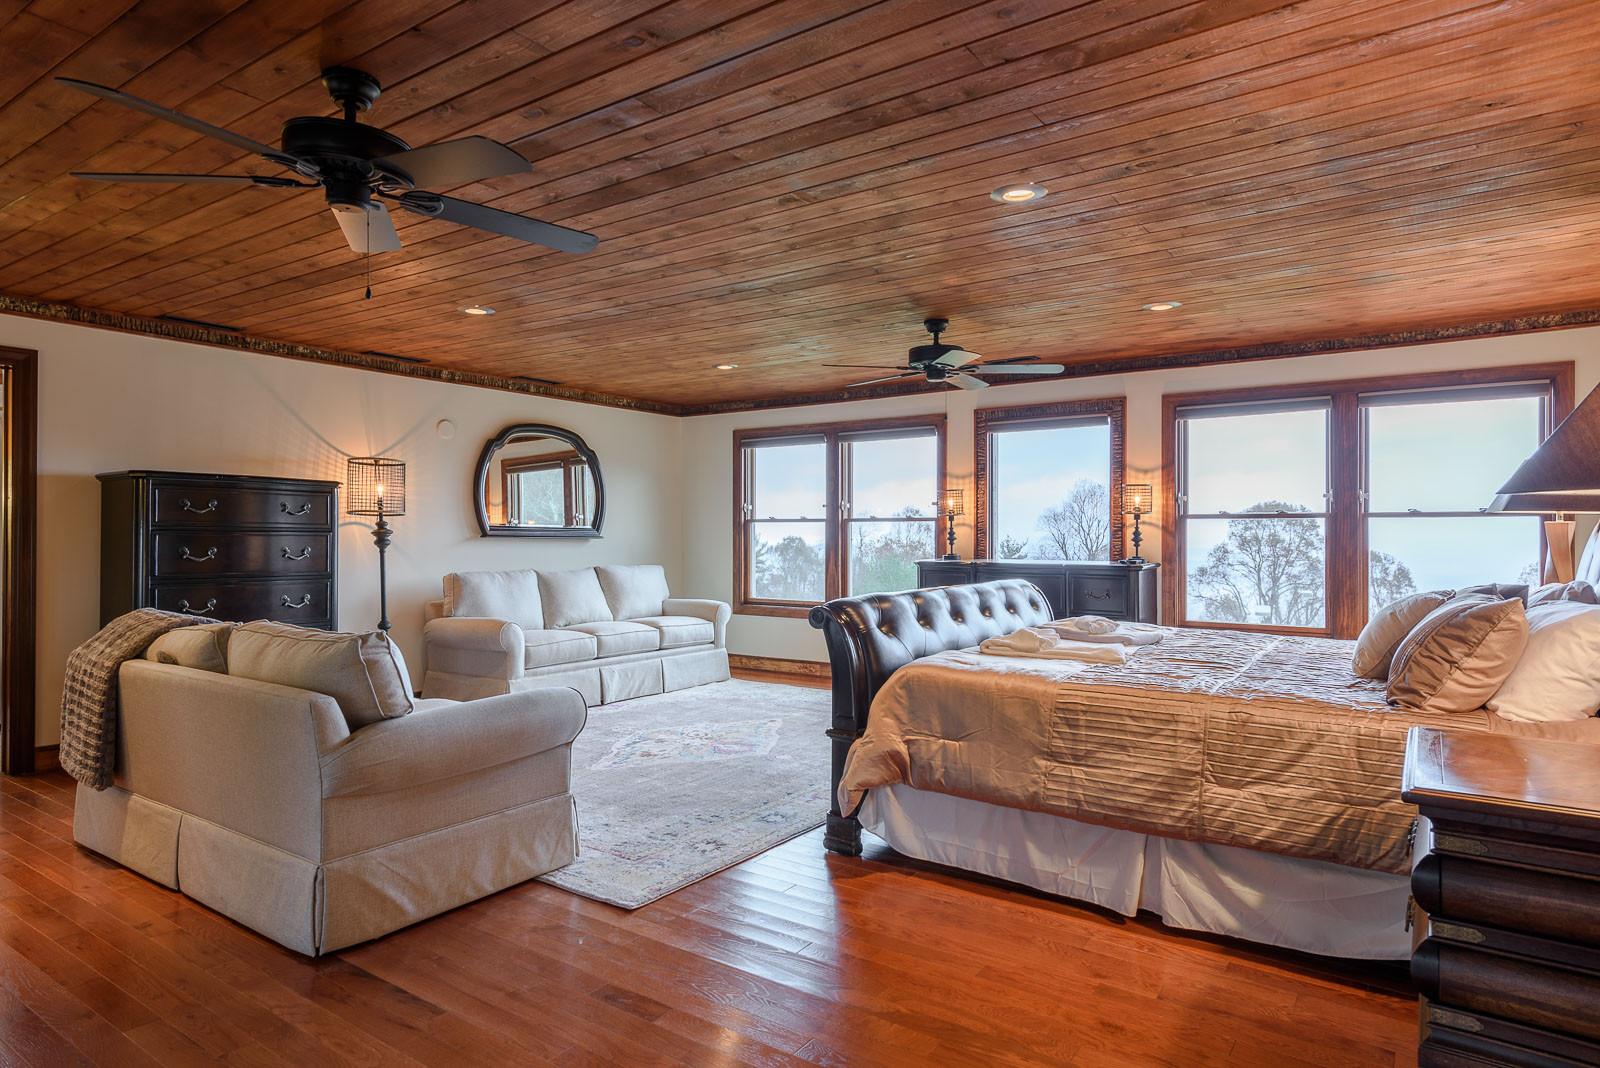 hardwood flooring boone nc of appalachian mountain lodge mountain family lodge boone family intended for 150139694